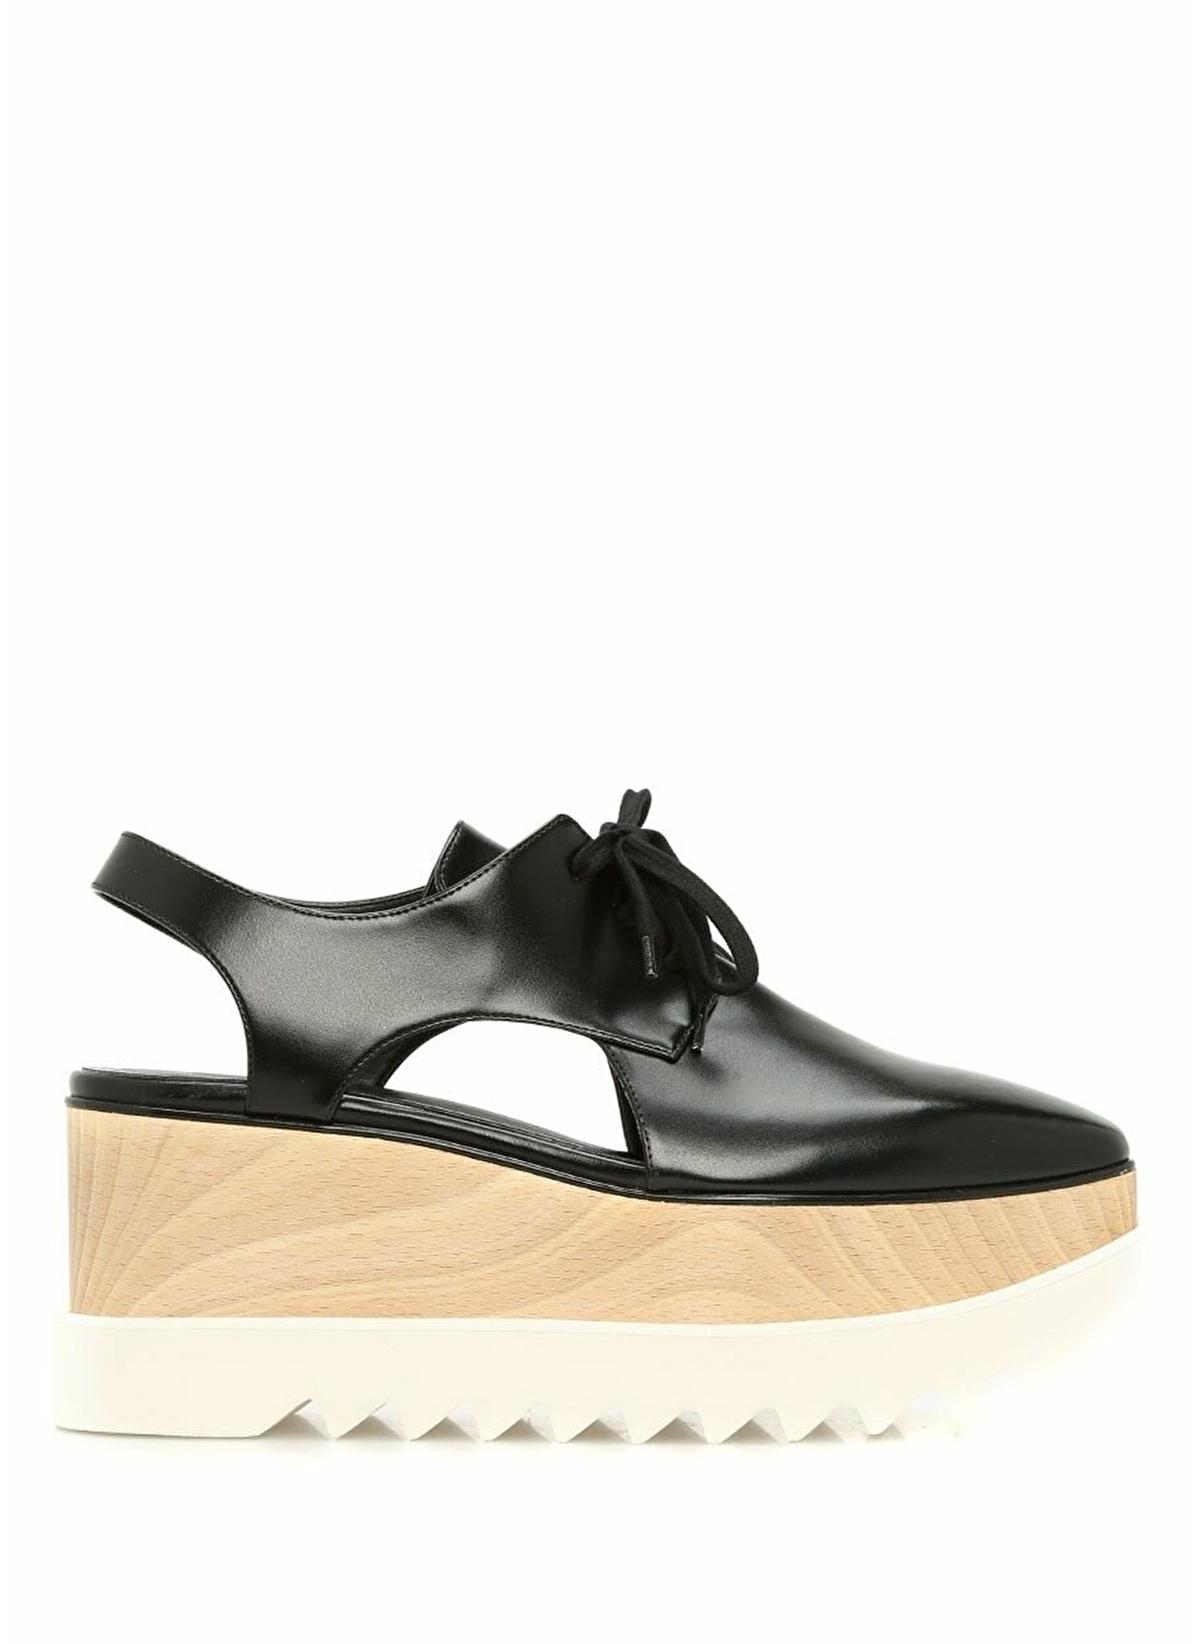 Stella Mccartney Dolgu Tabanlı Loafer Ayakkabı 101213773 K Loafer – 2649.0 TL